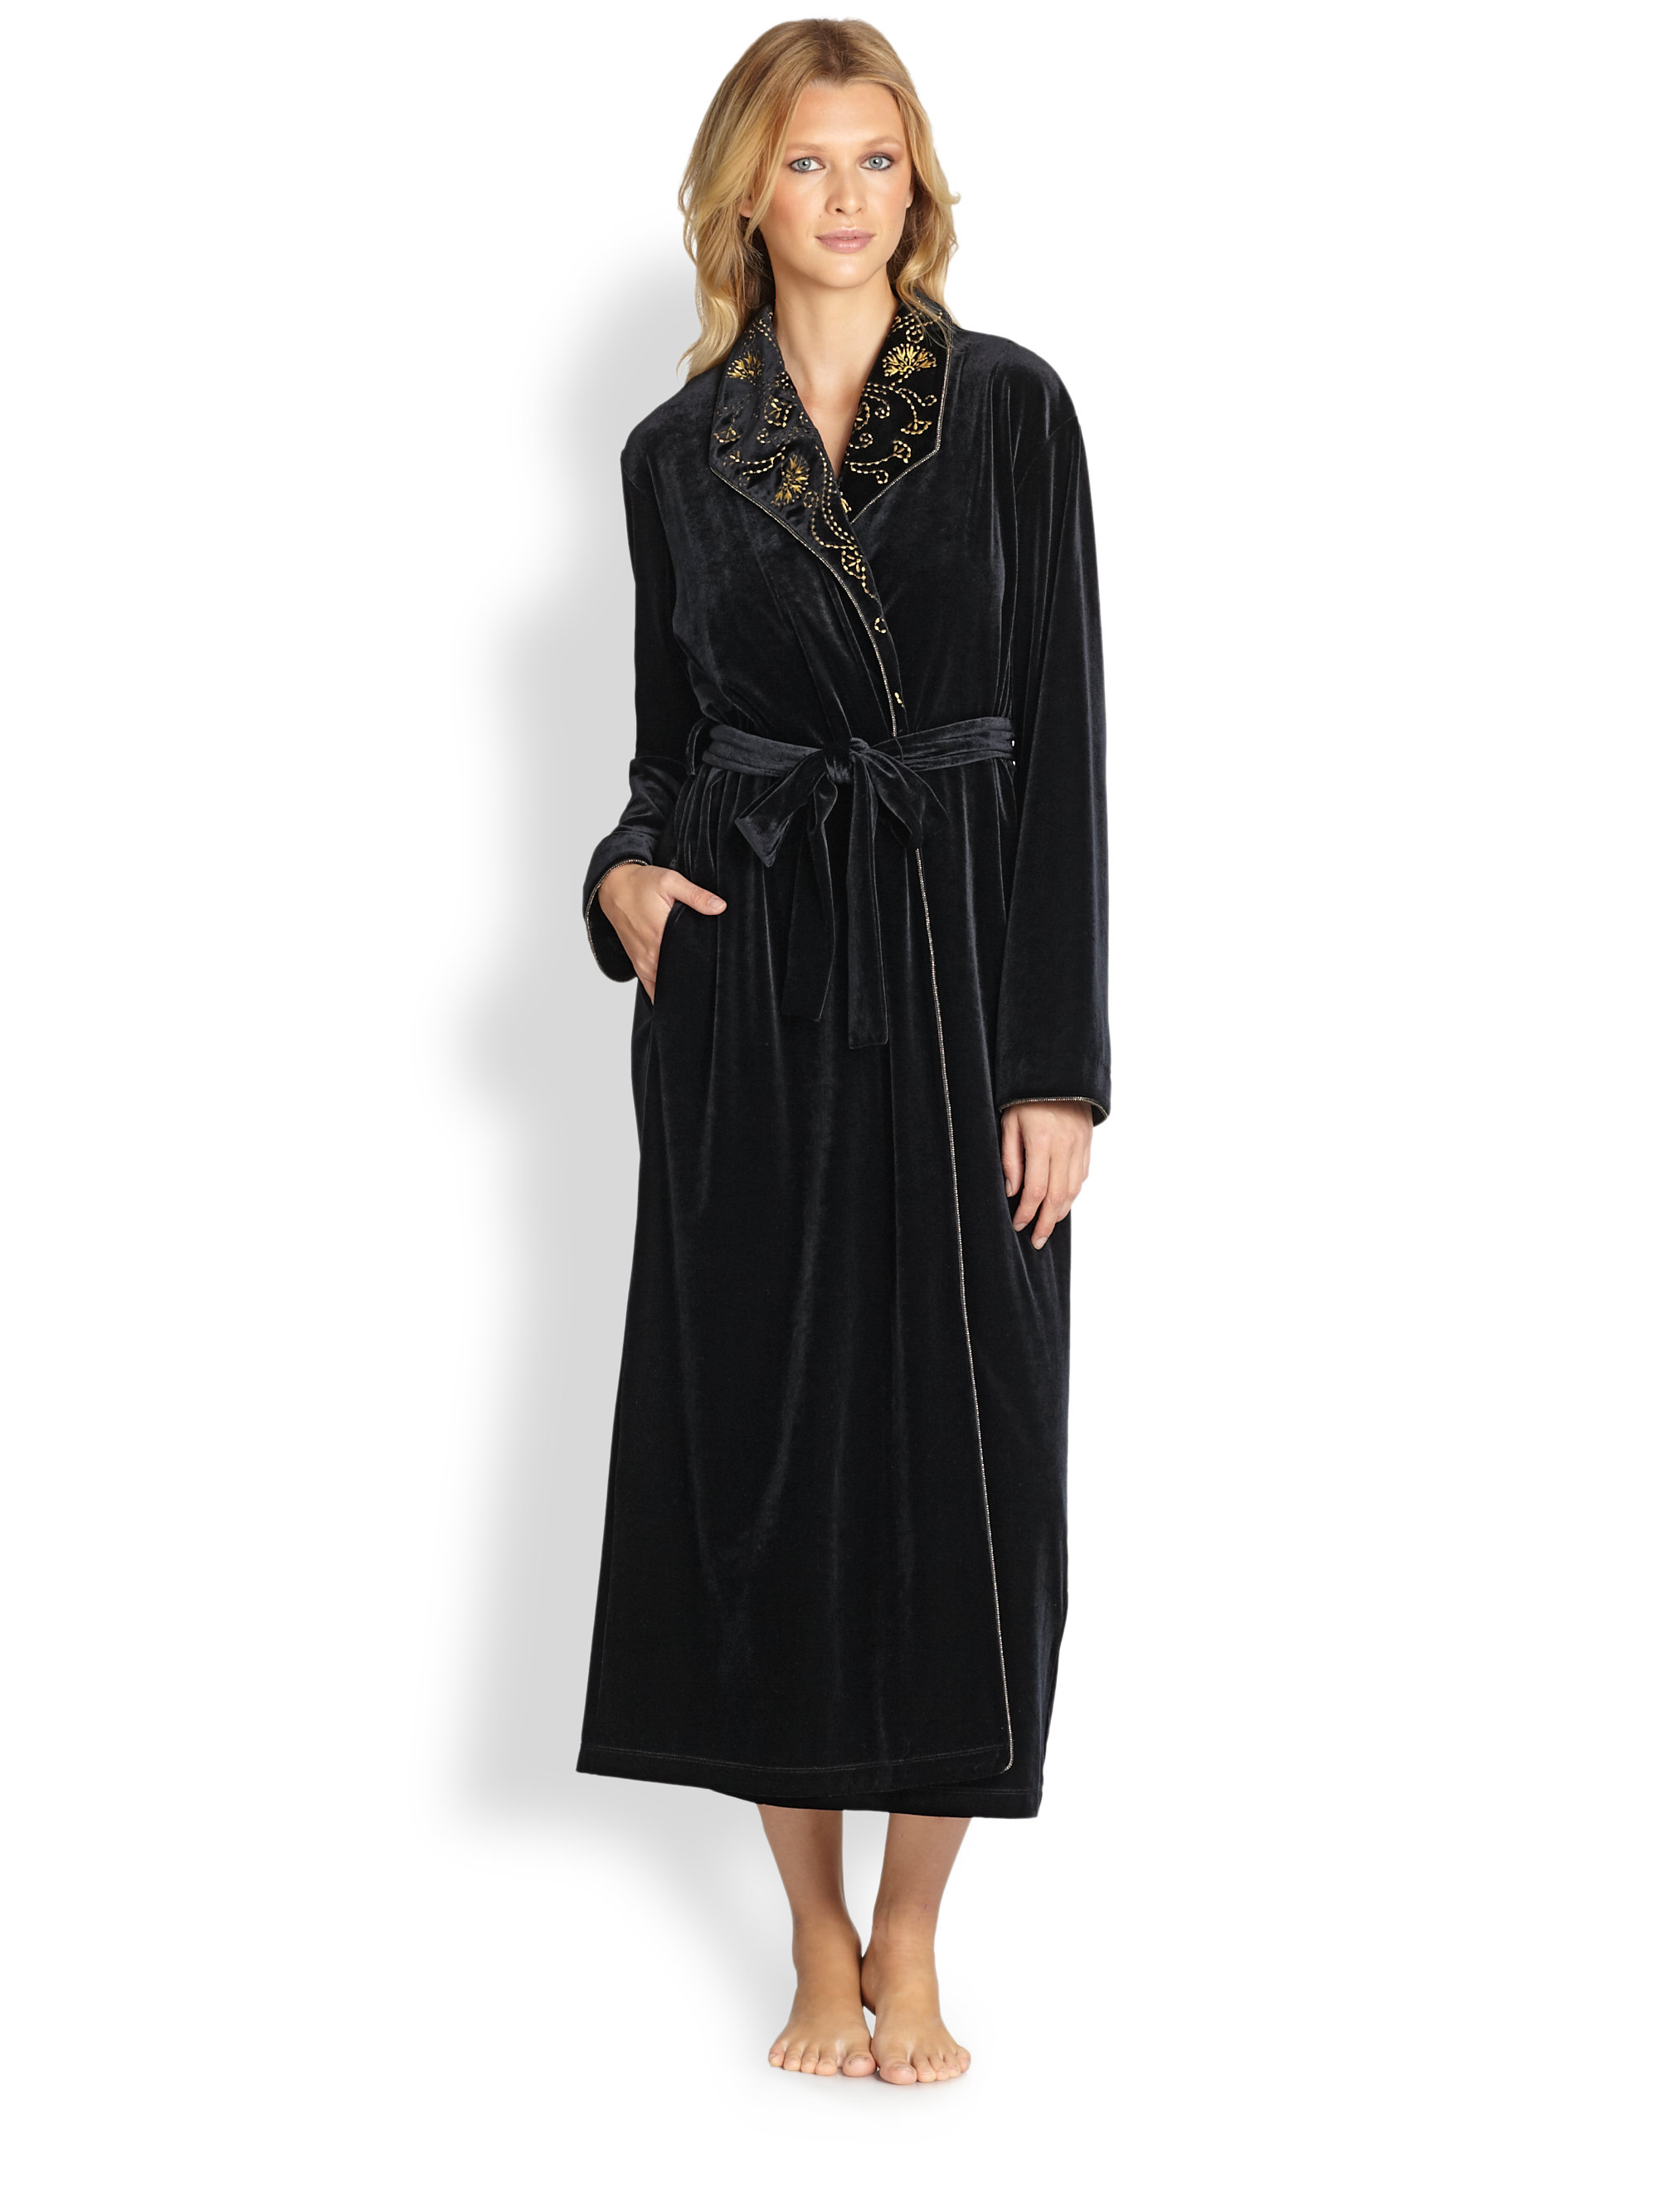 Oscar de la renta Embroidered Velvet Robe in Black  Lyst